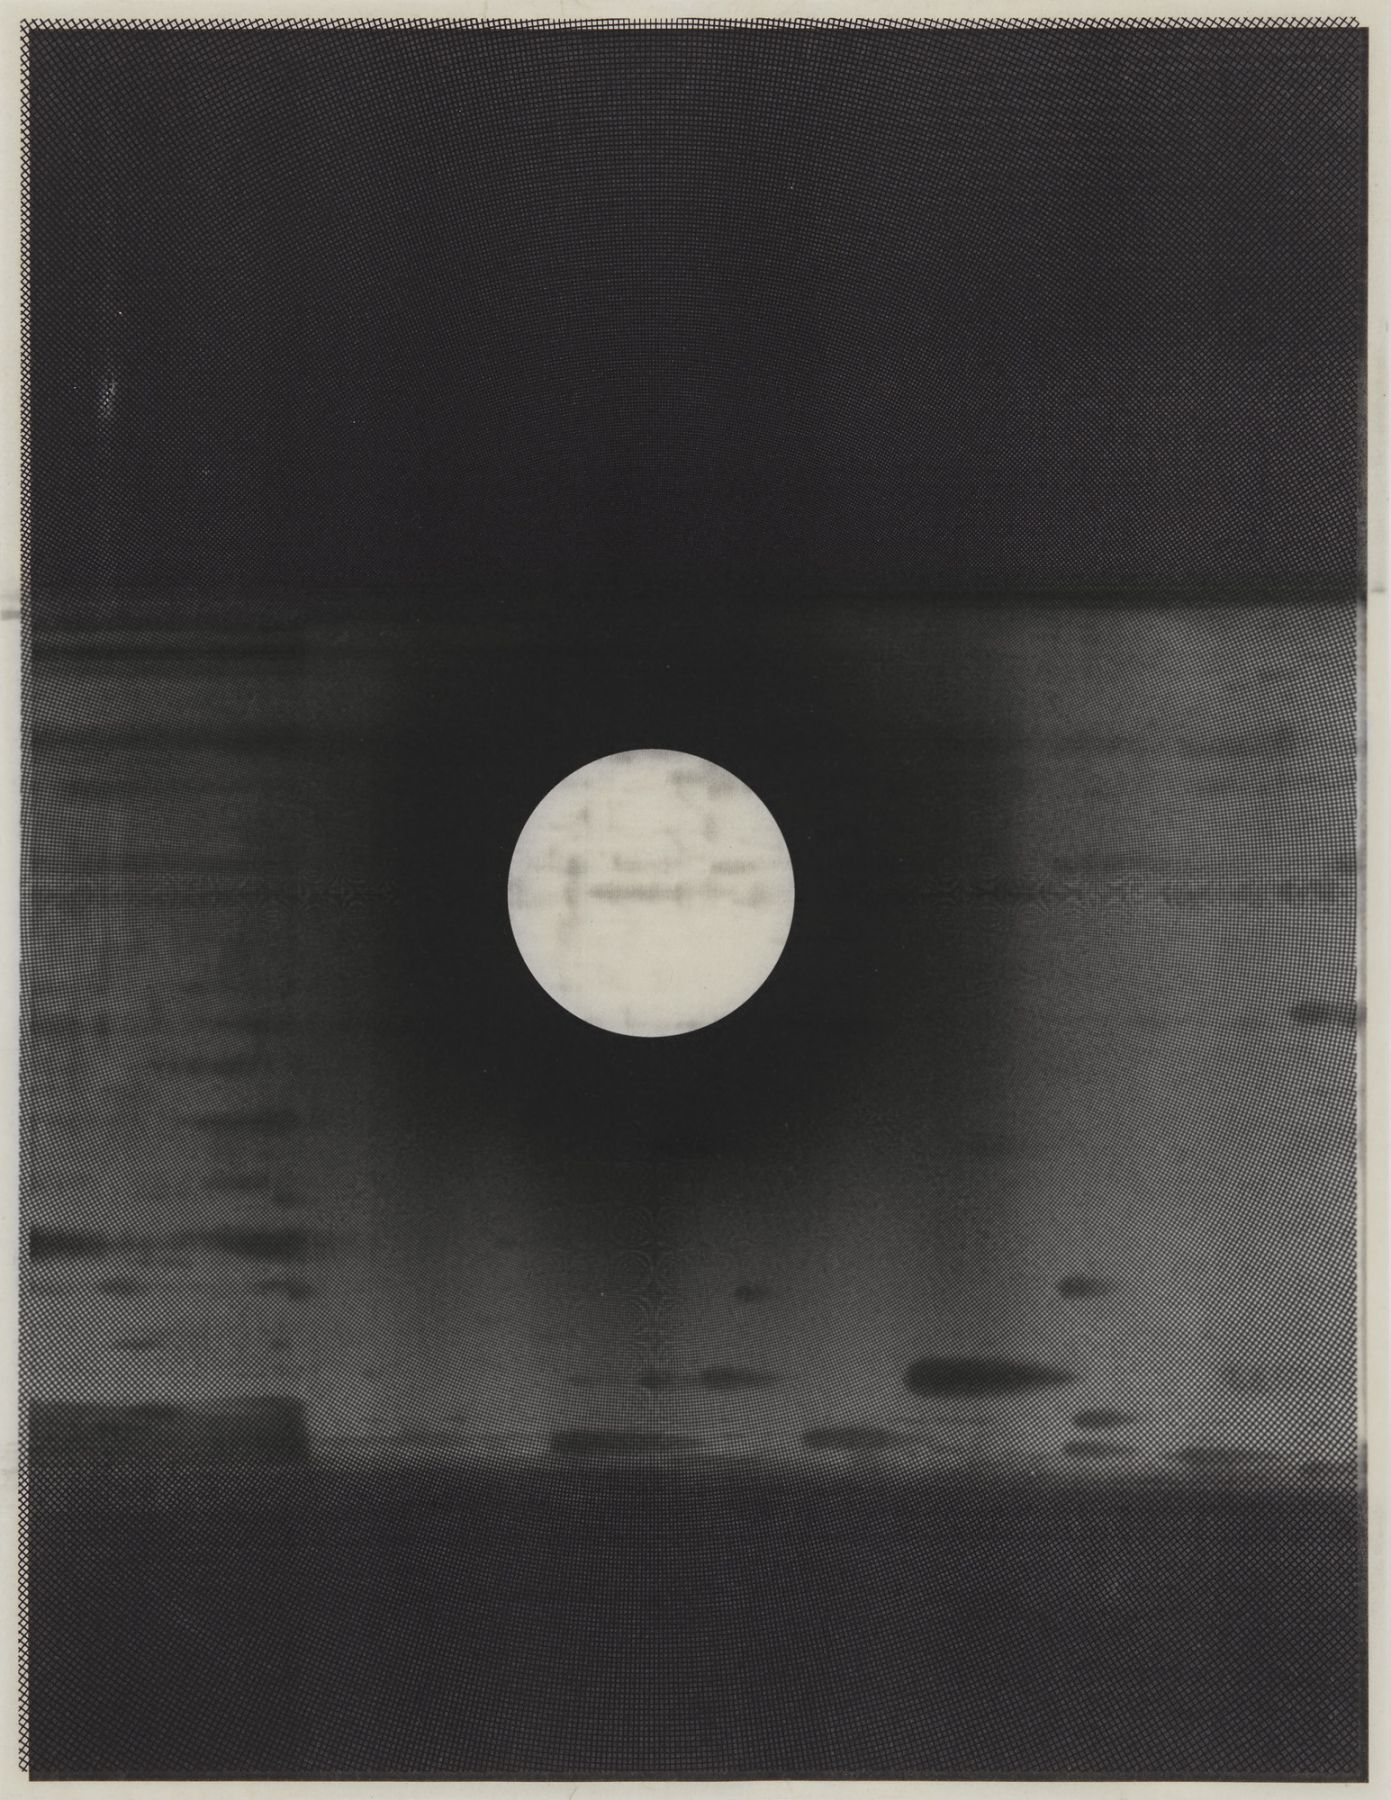 Untitled, 2017 Laser toner on paper, unique